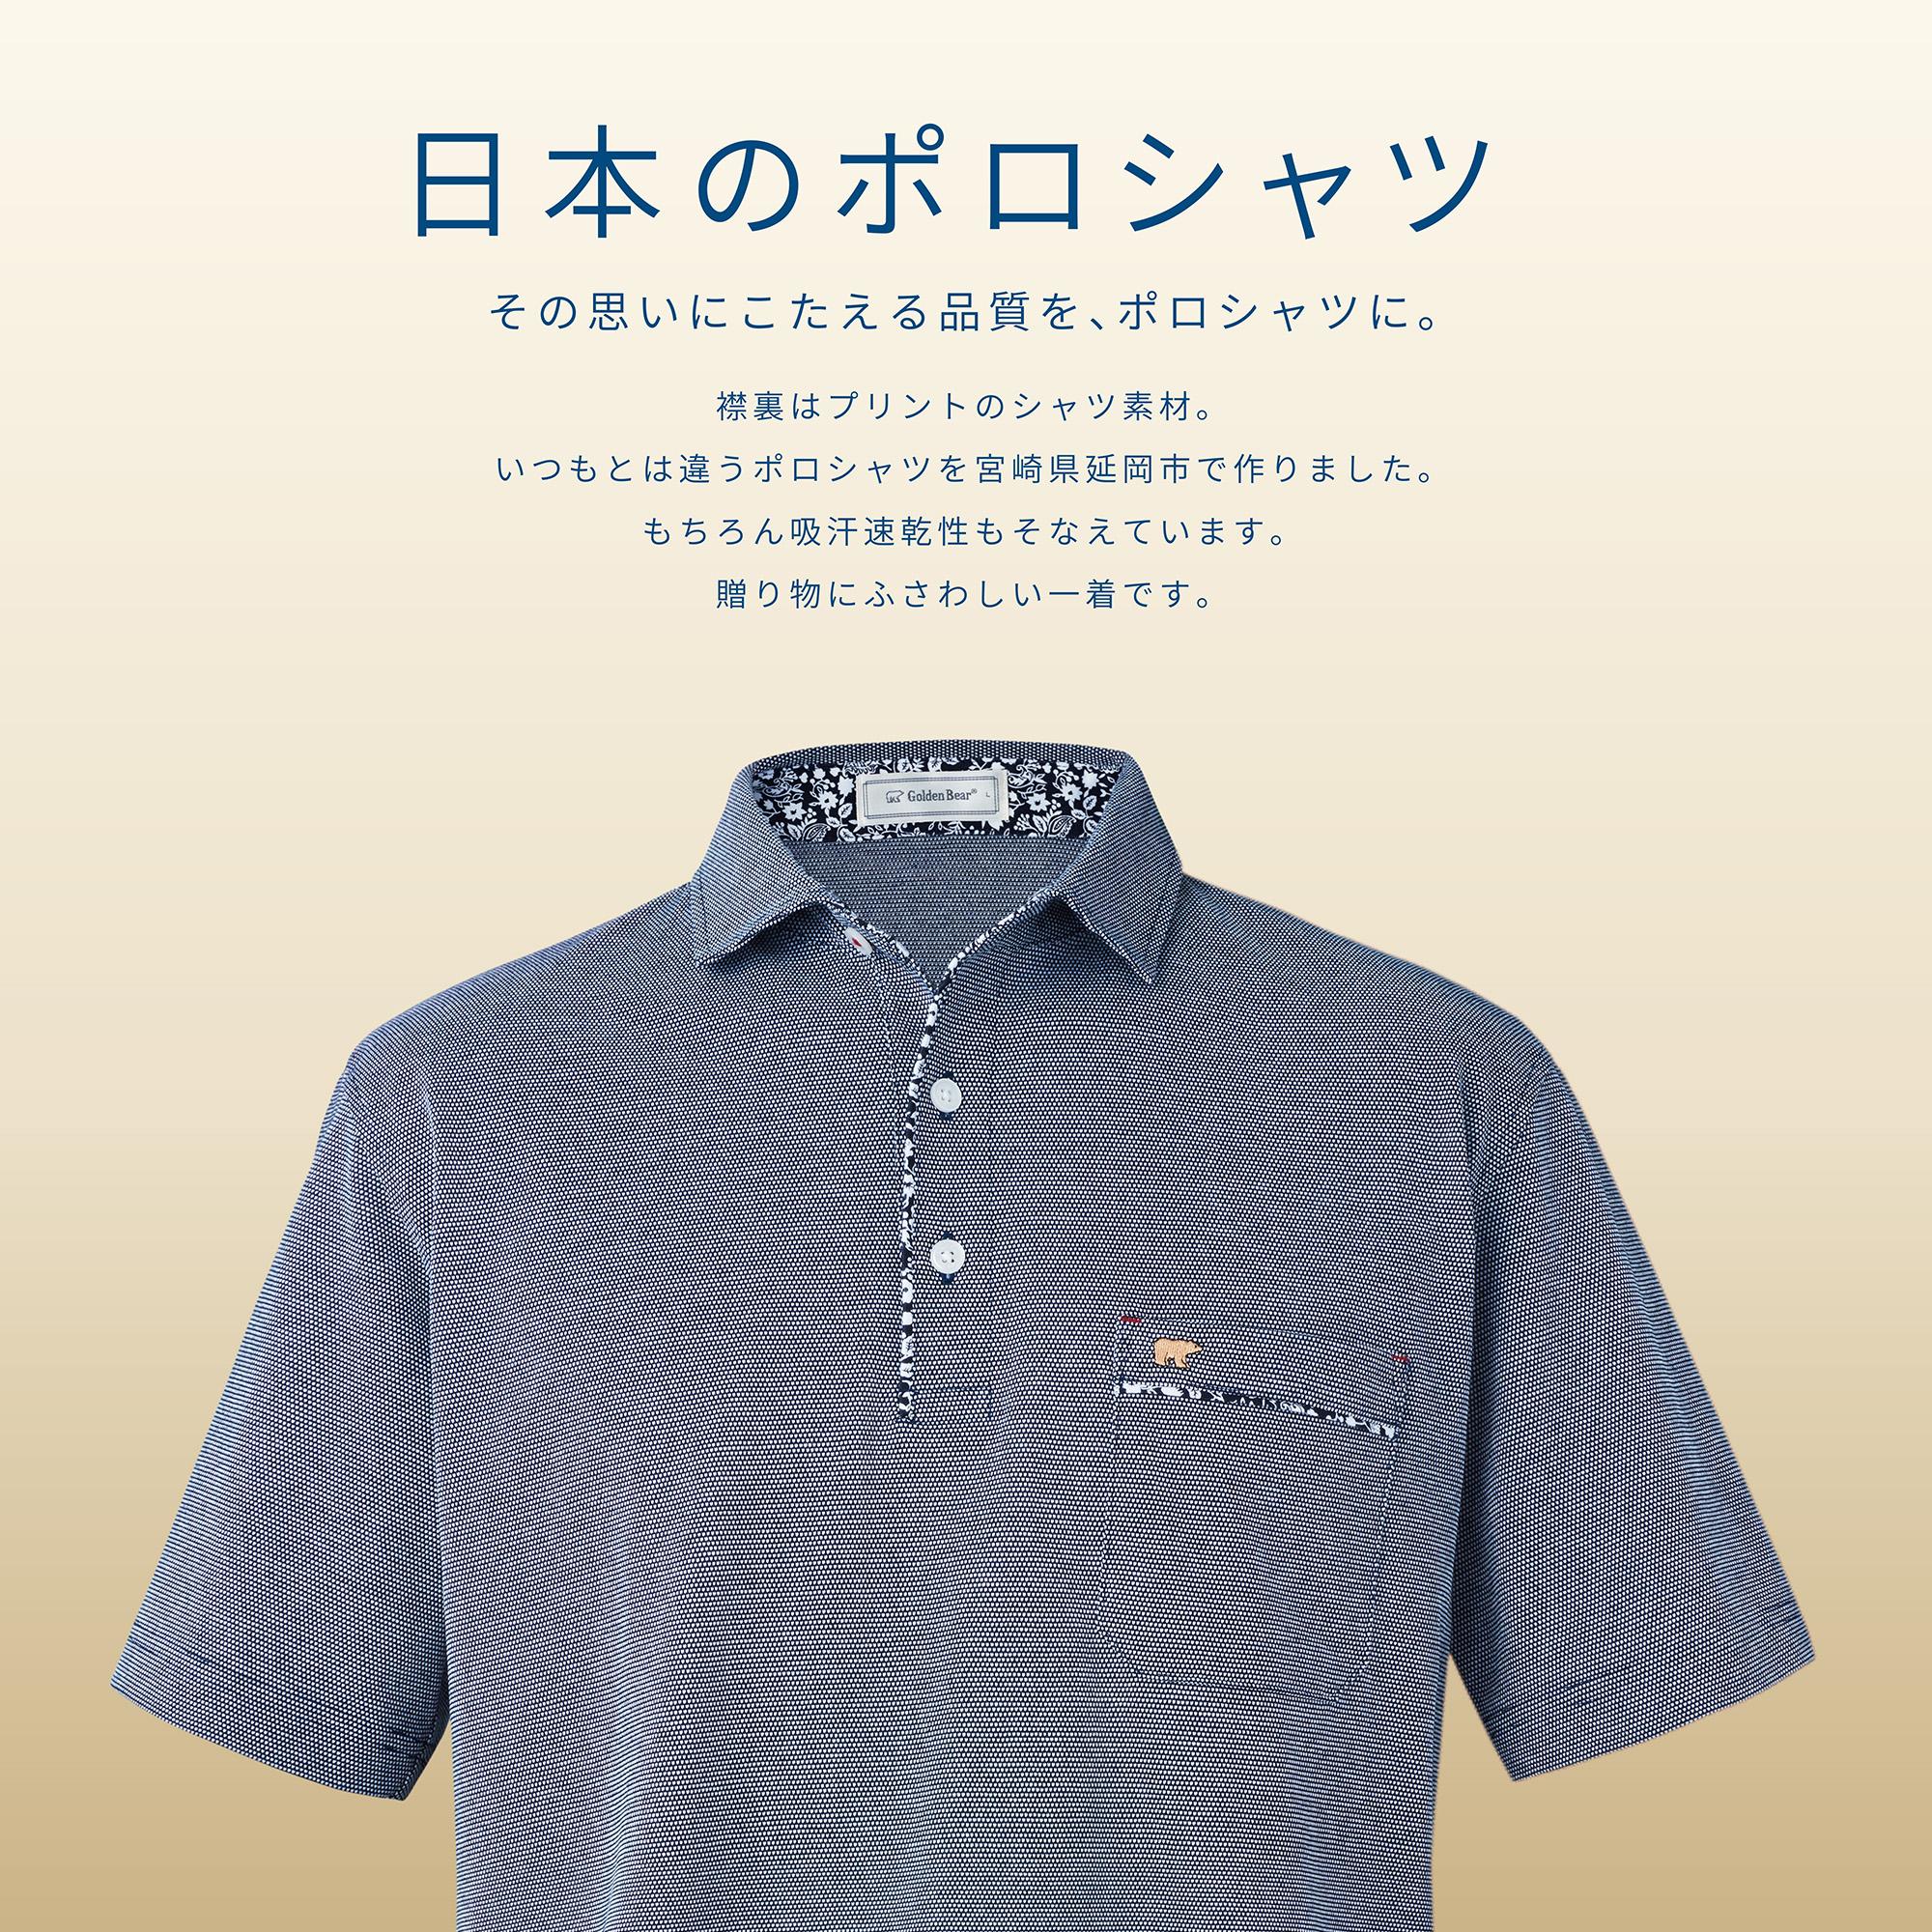 【Golden Bear Mens】日本のポロシャツ 新聞広告掲載のお知らせ